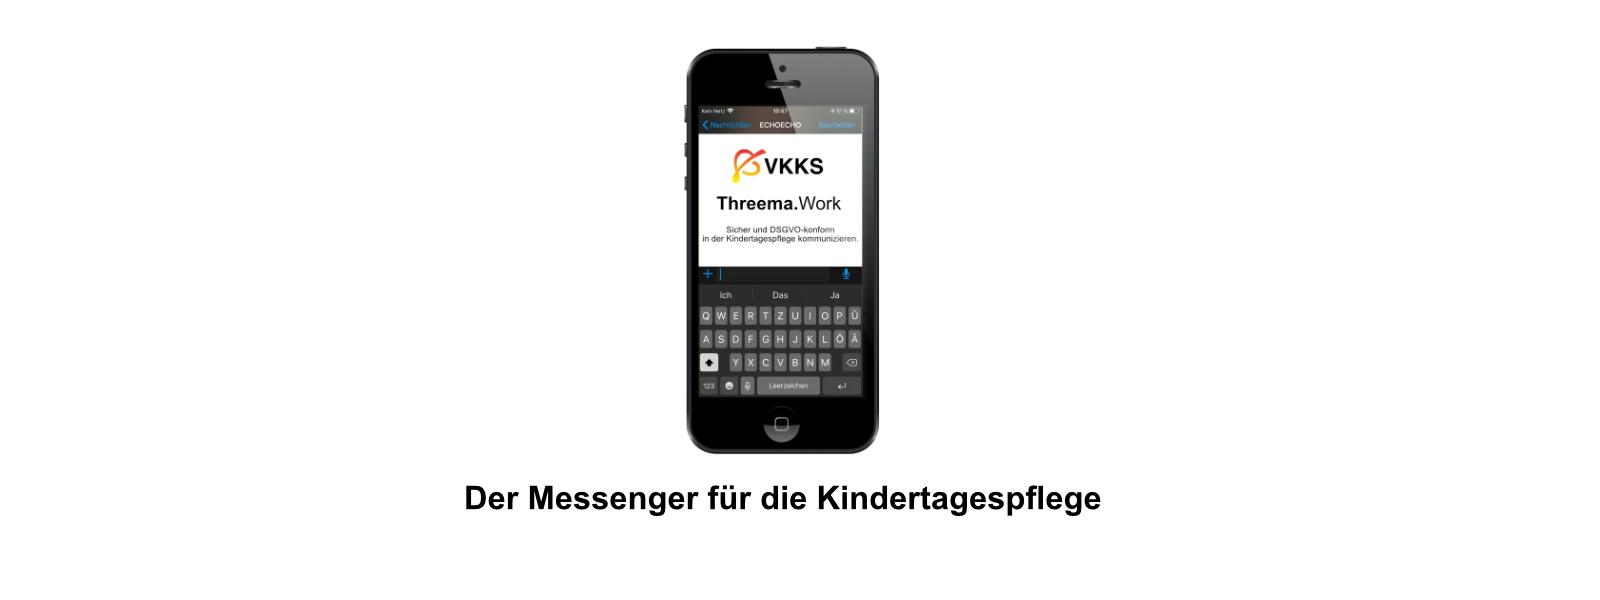 Threema.work VKKS